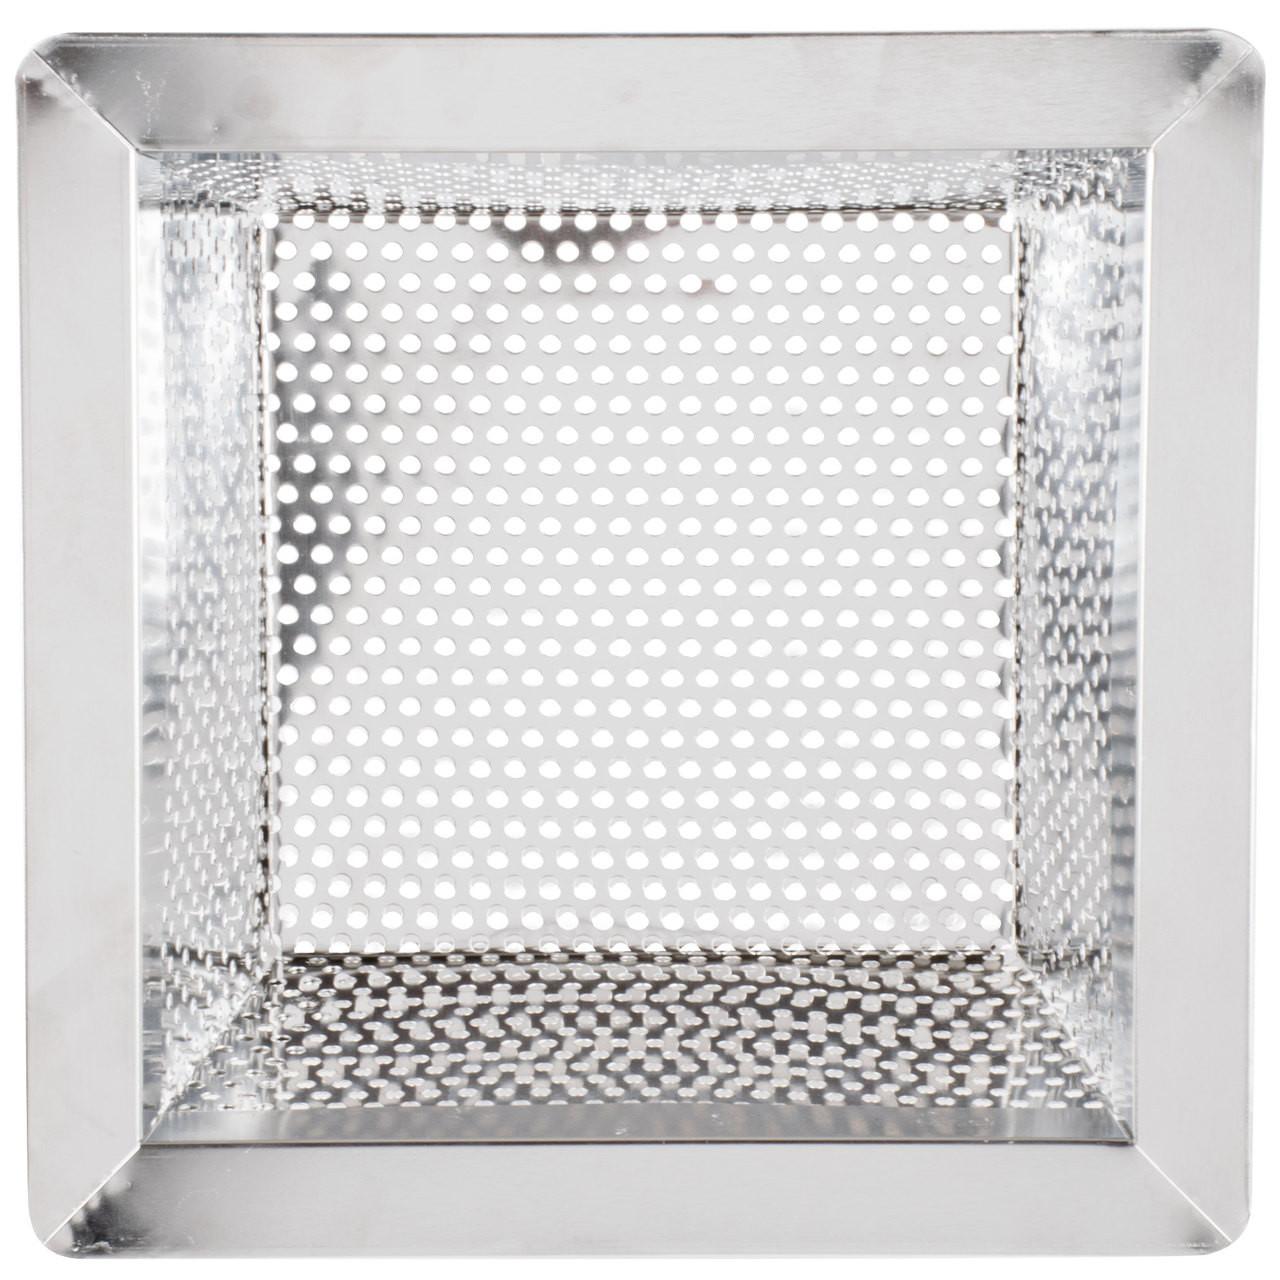 10 Inch X 10 Inch Stainless Steel Strainer Basket 5